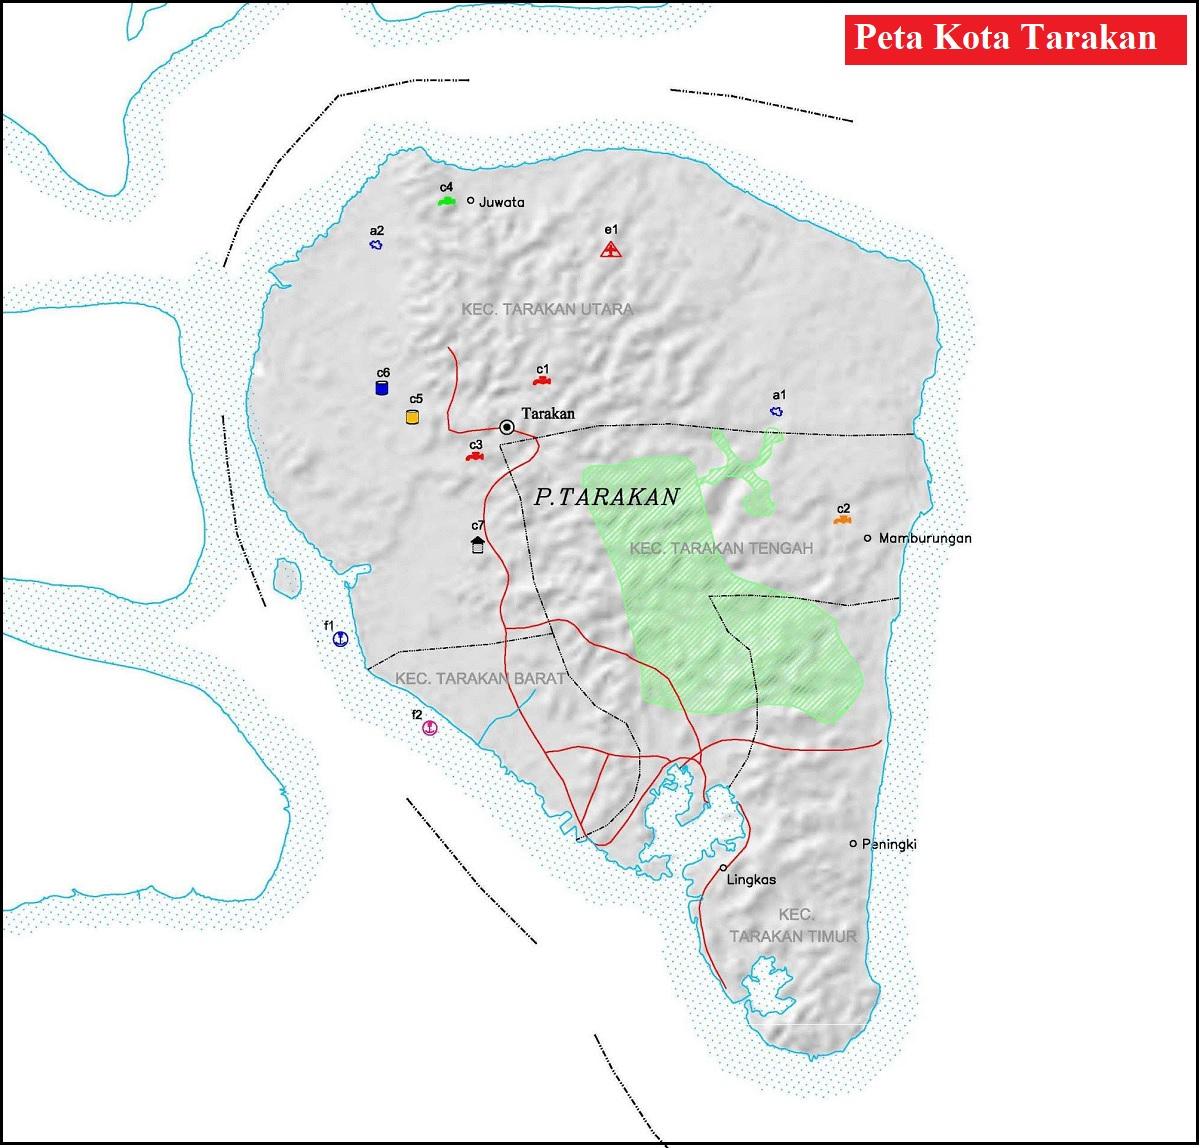 Peta Kota Tarakan Kaltim Lengkap